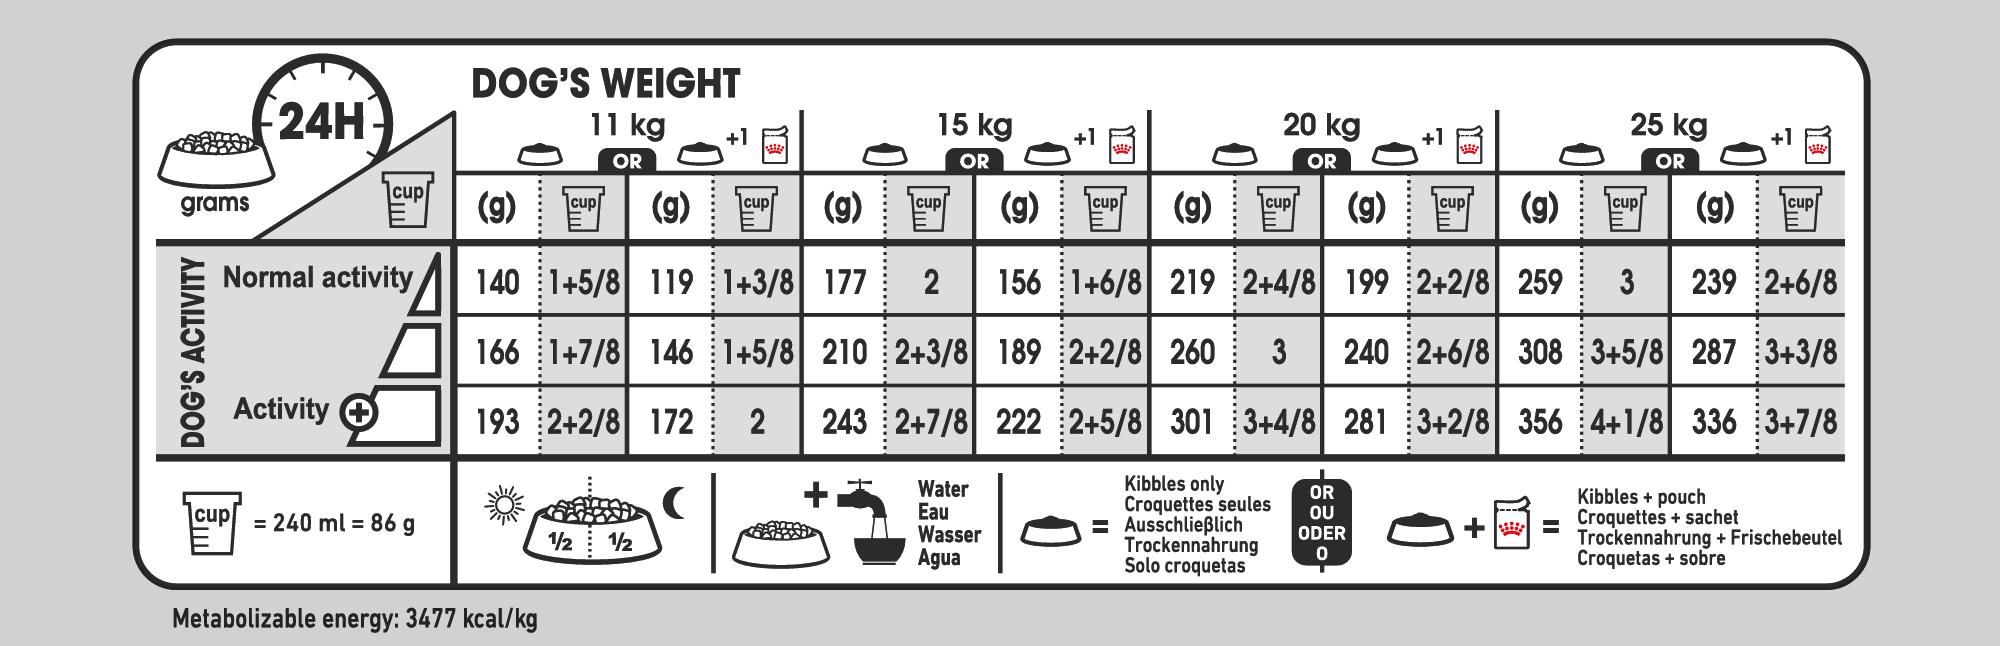 Medium Neutered Care feeding guide